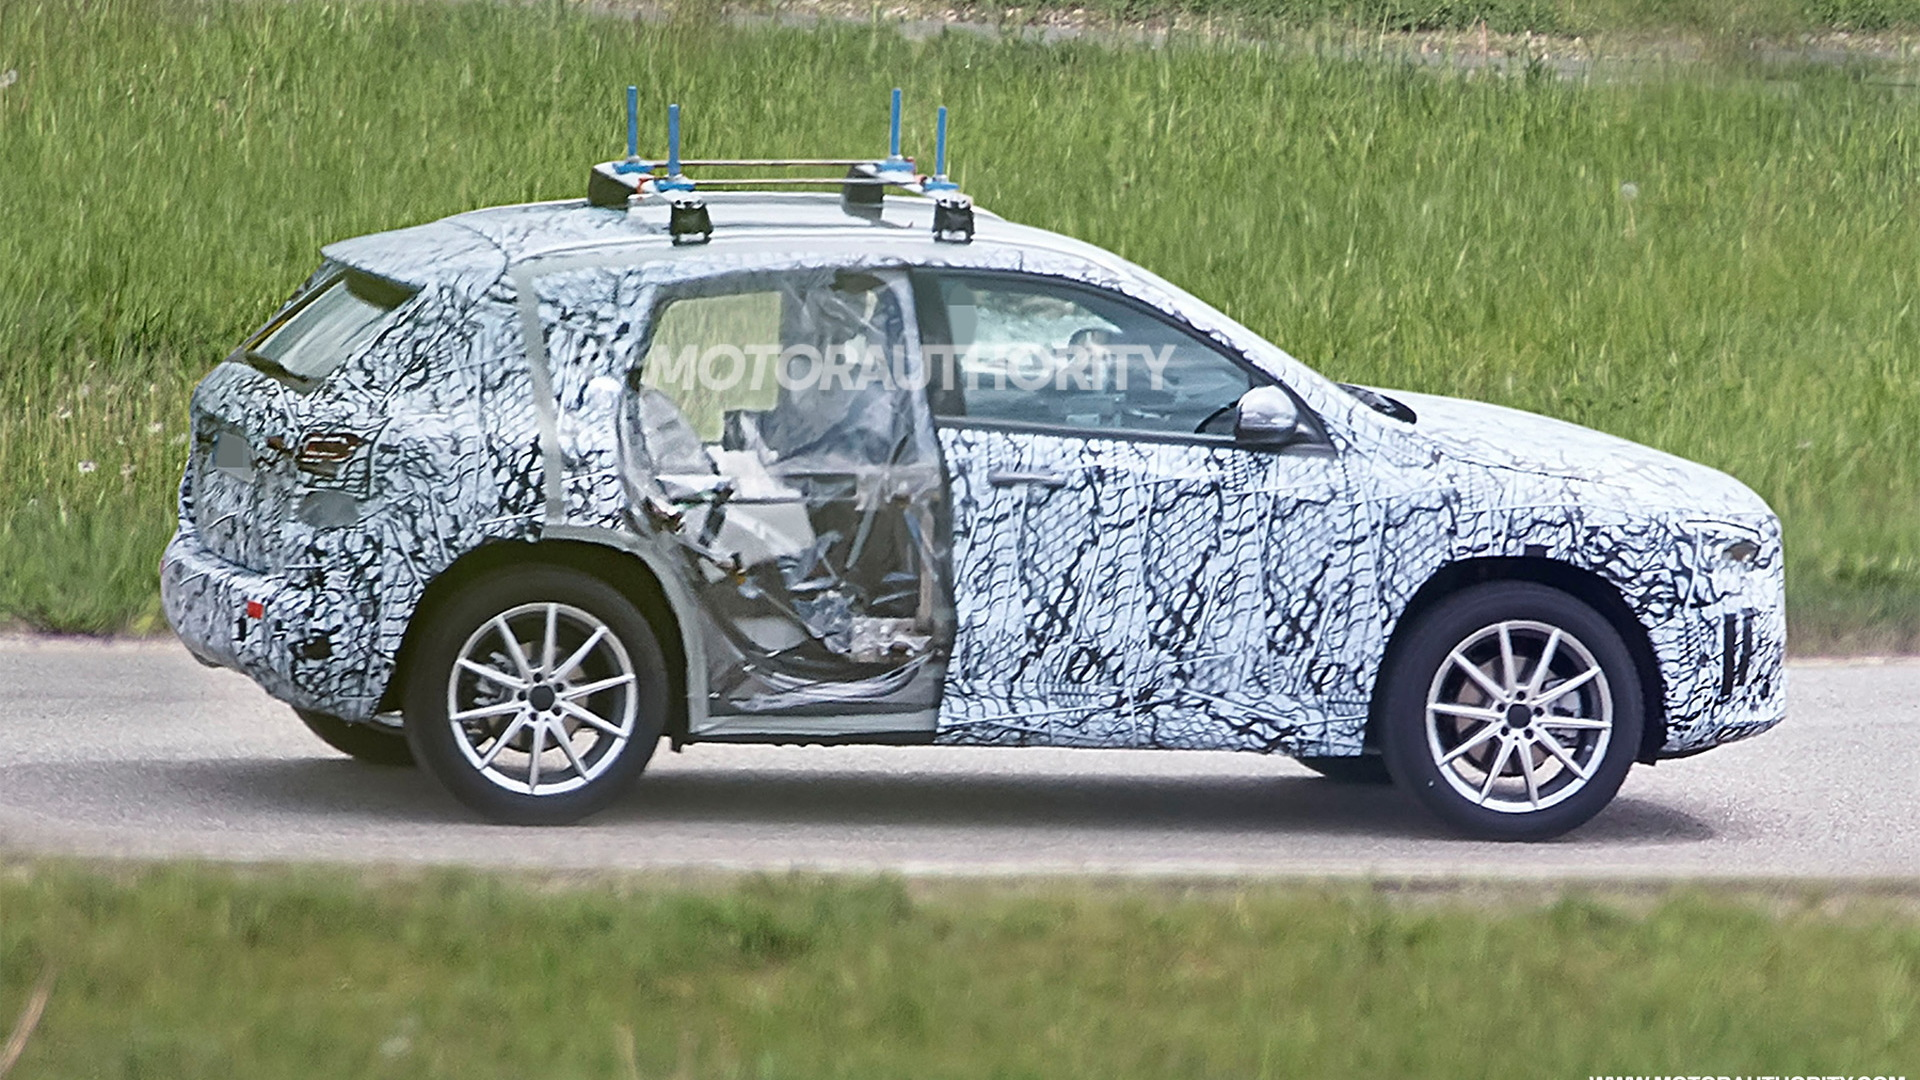 2021 Mercedes-Benz GLA spy shots - Image via S. Baldauf/SB-Medien